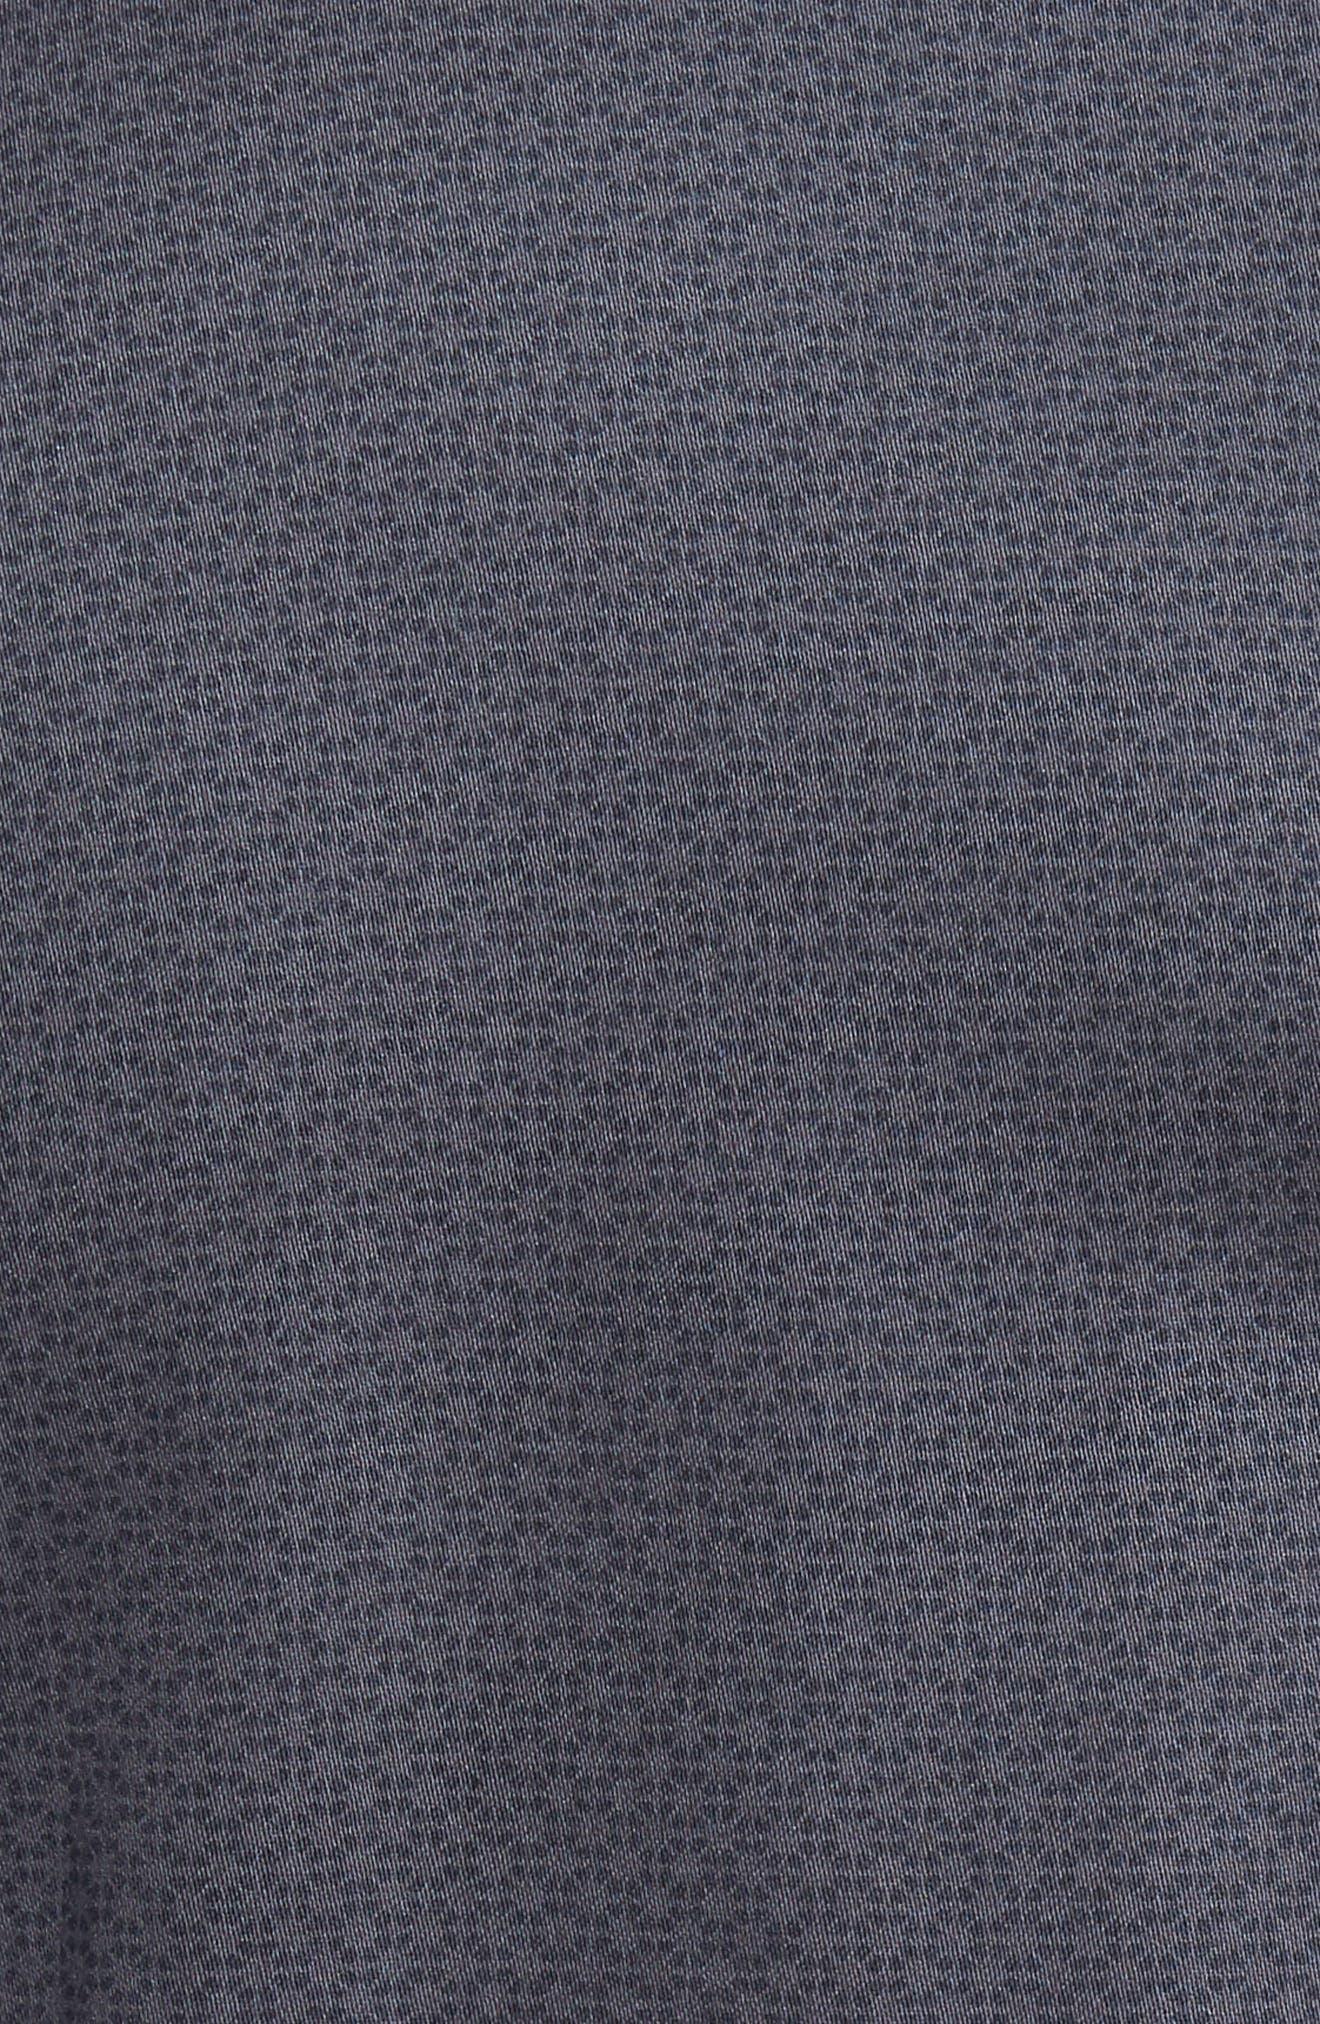 Strazbo Tonal Print Sport Shirt,                             Alternate thumbnail 5, color,                             030